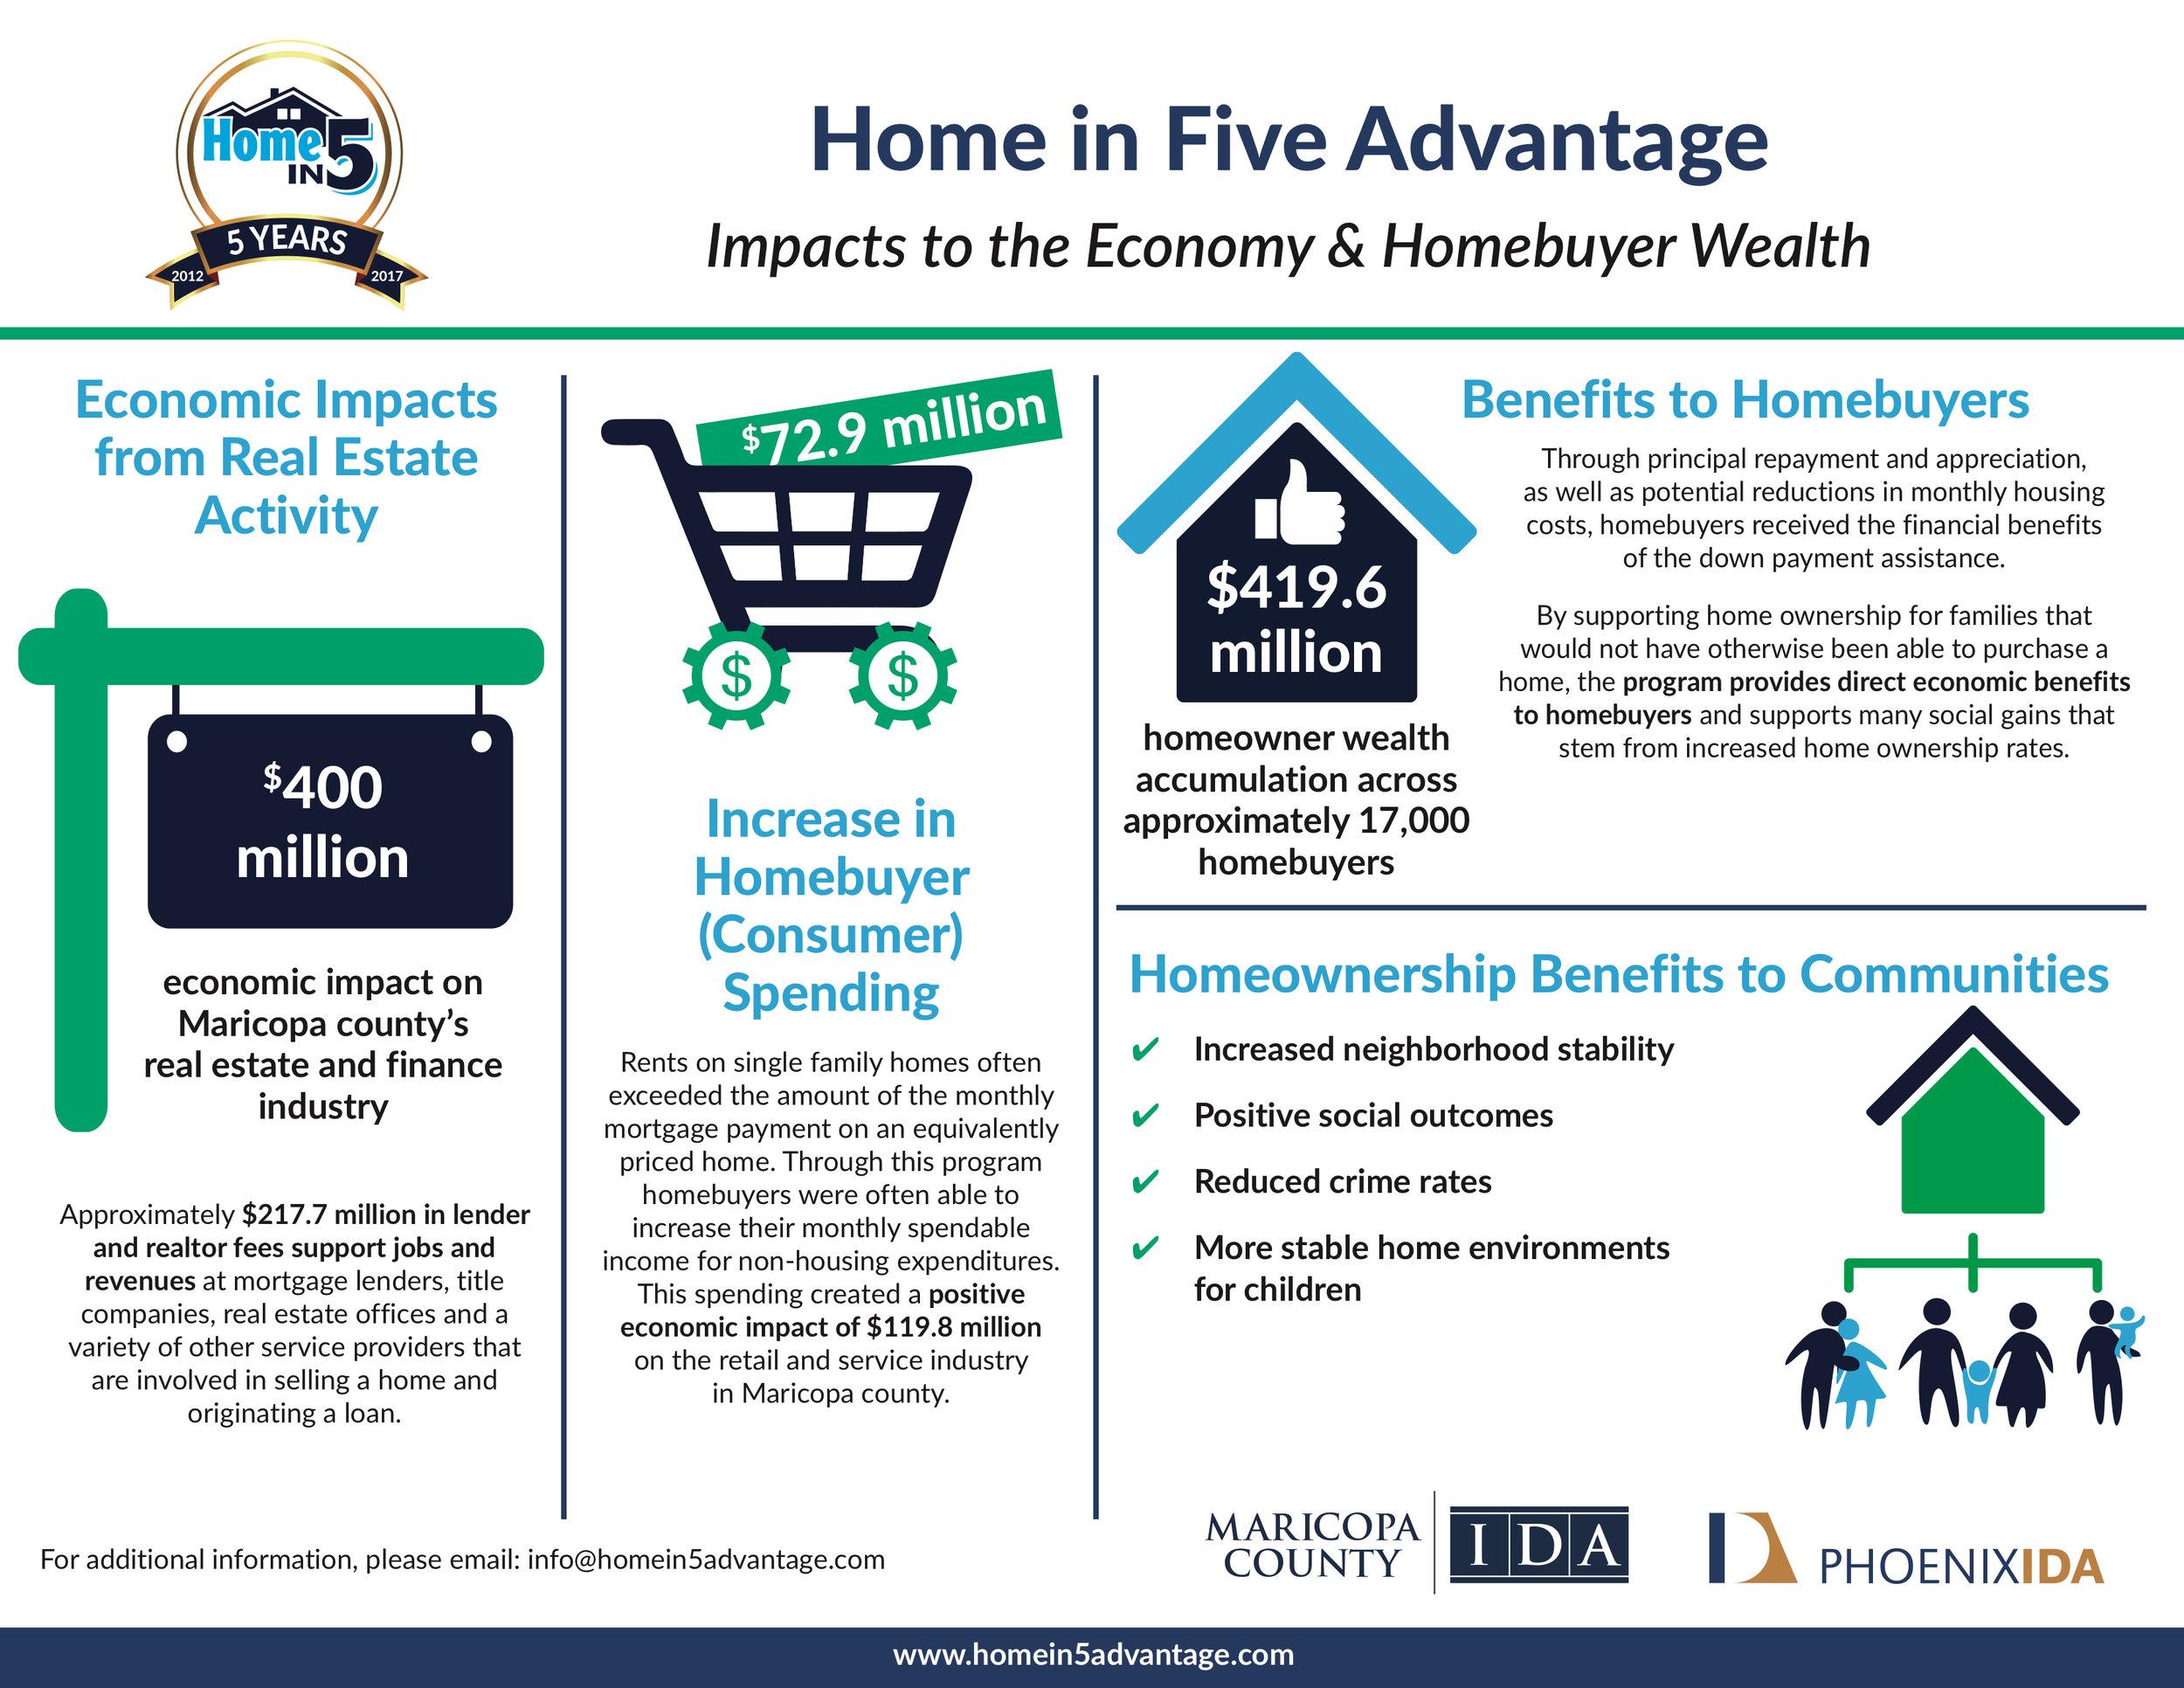 Home_in_Five_Advantage_Economic_Impact_Infographic_FINAL.jpg